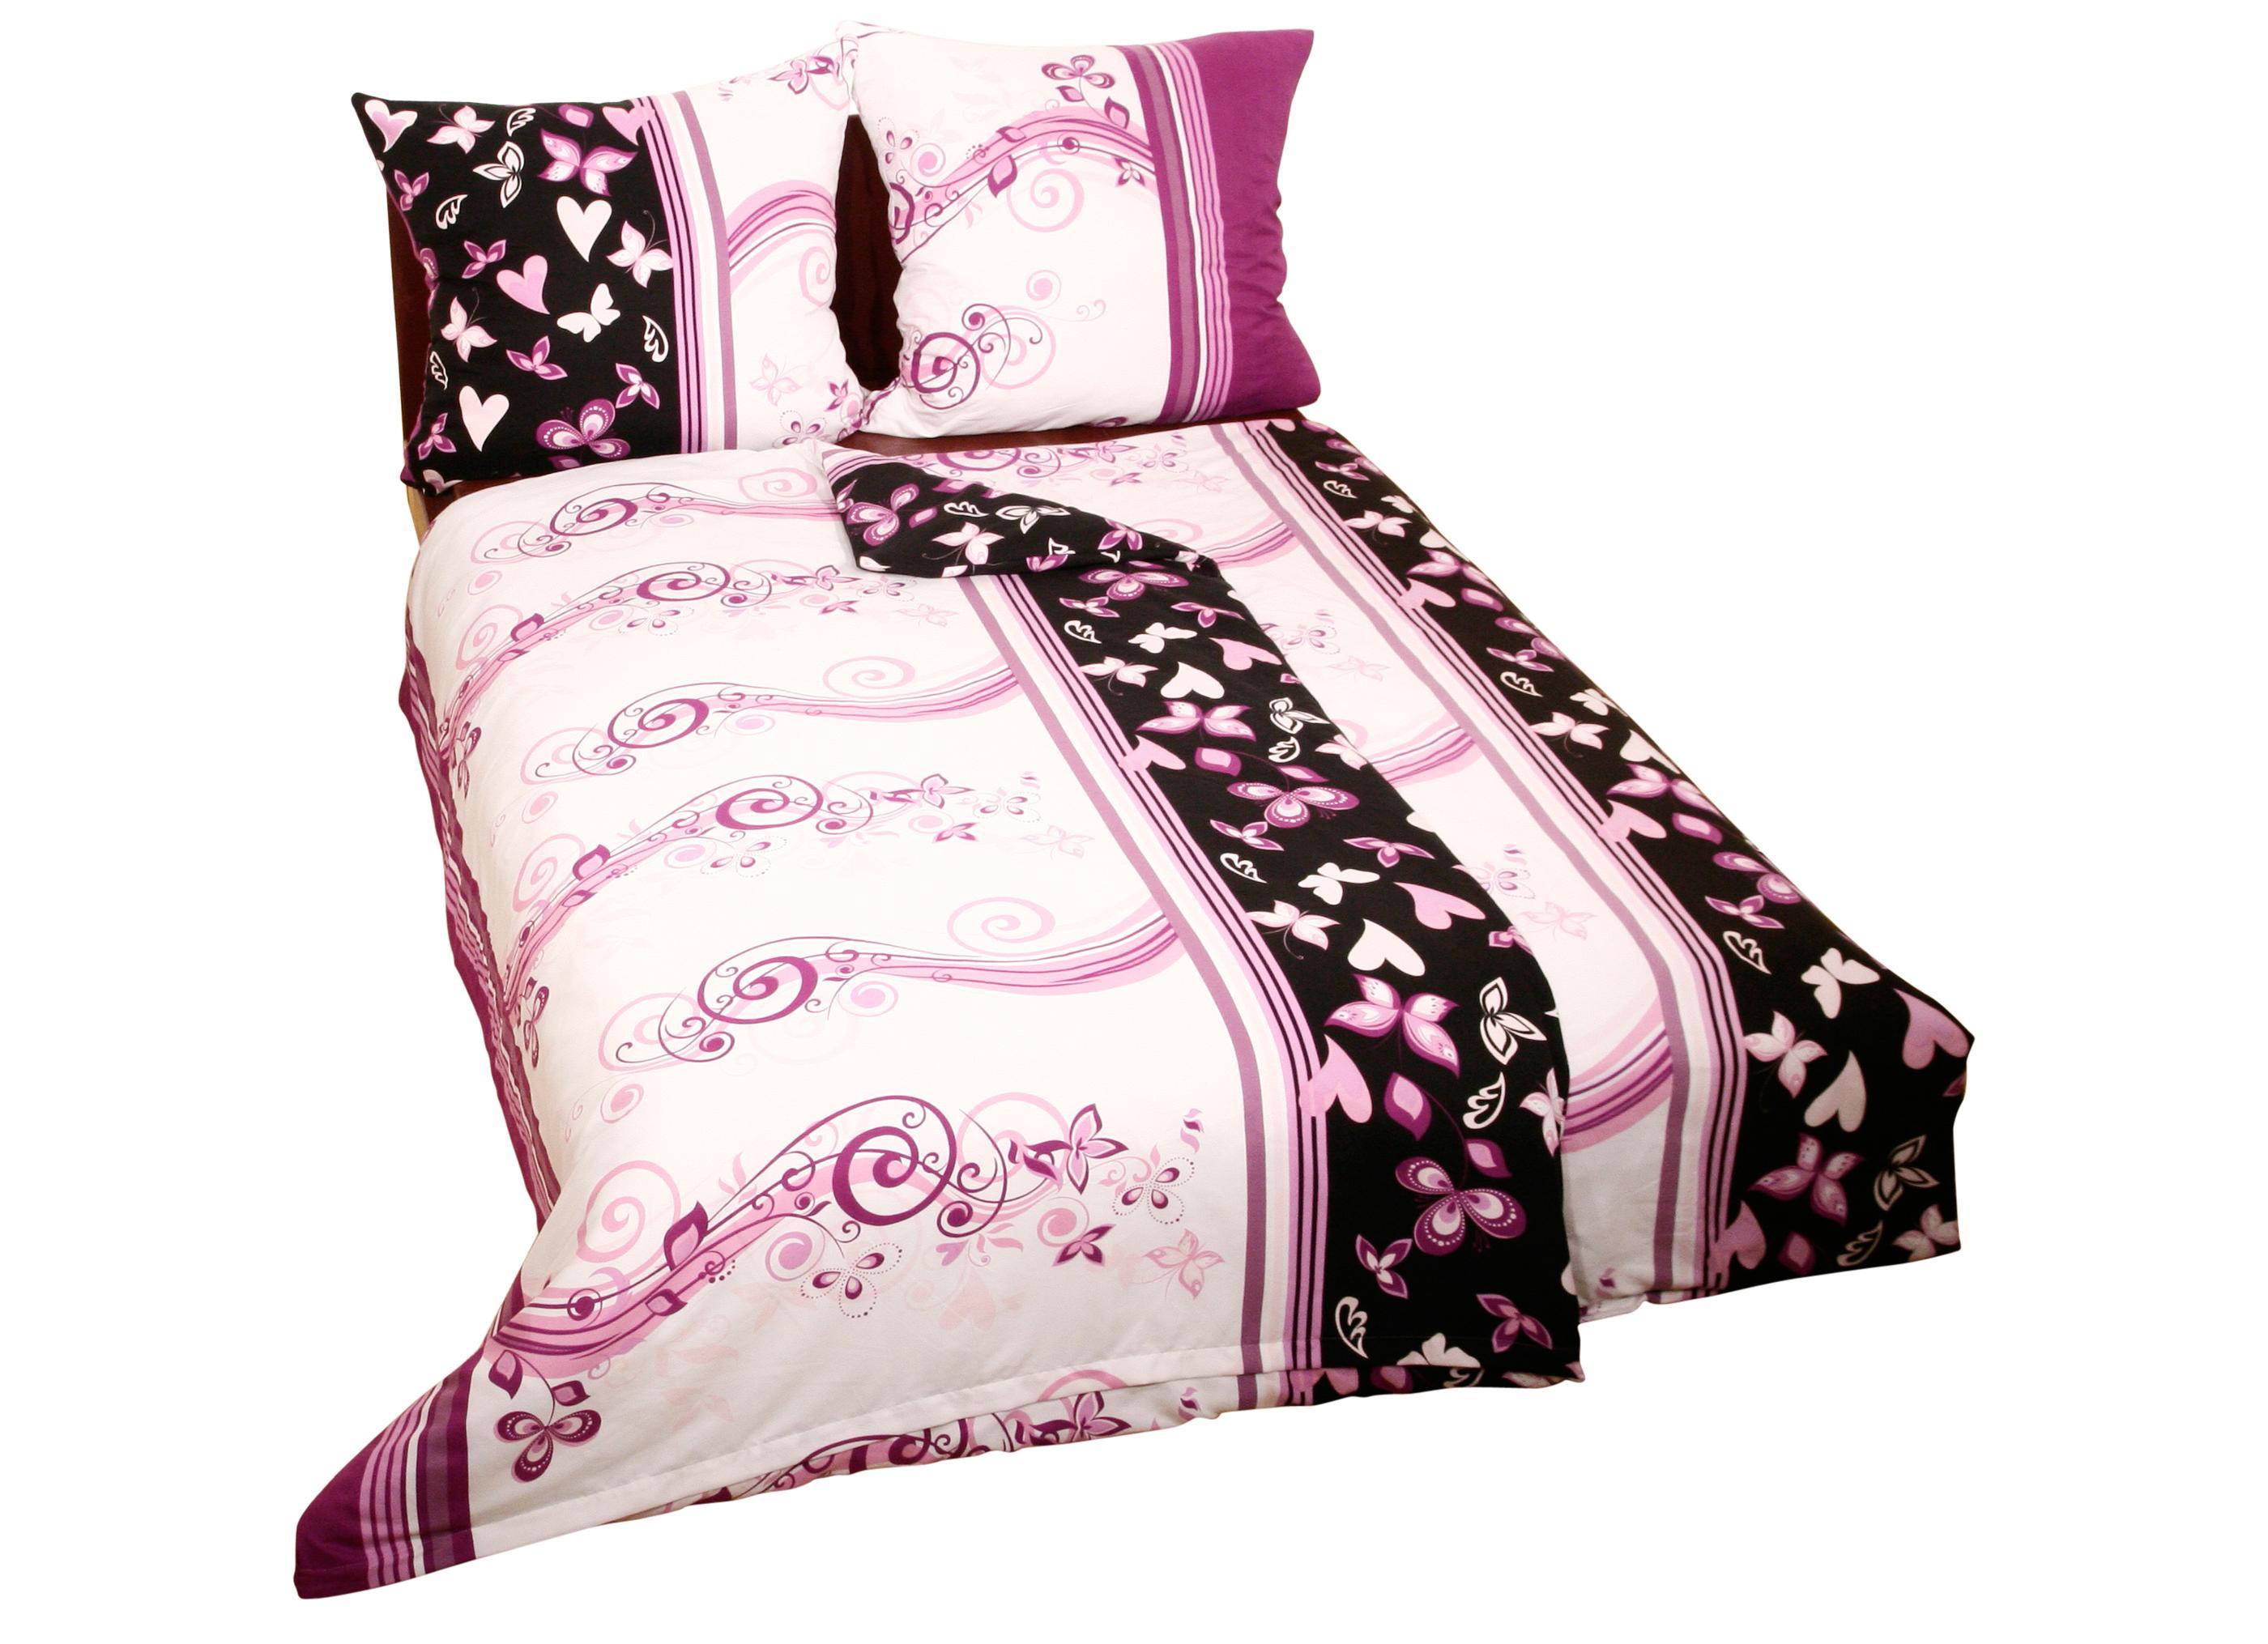 thermo biber bettw sche. Black Bedroom Furniture Sets. Home Design Ideas